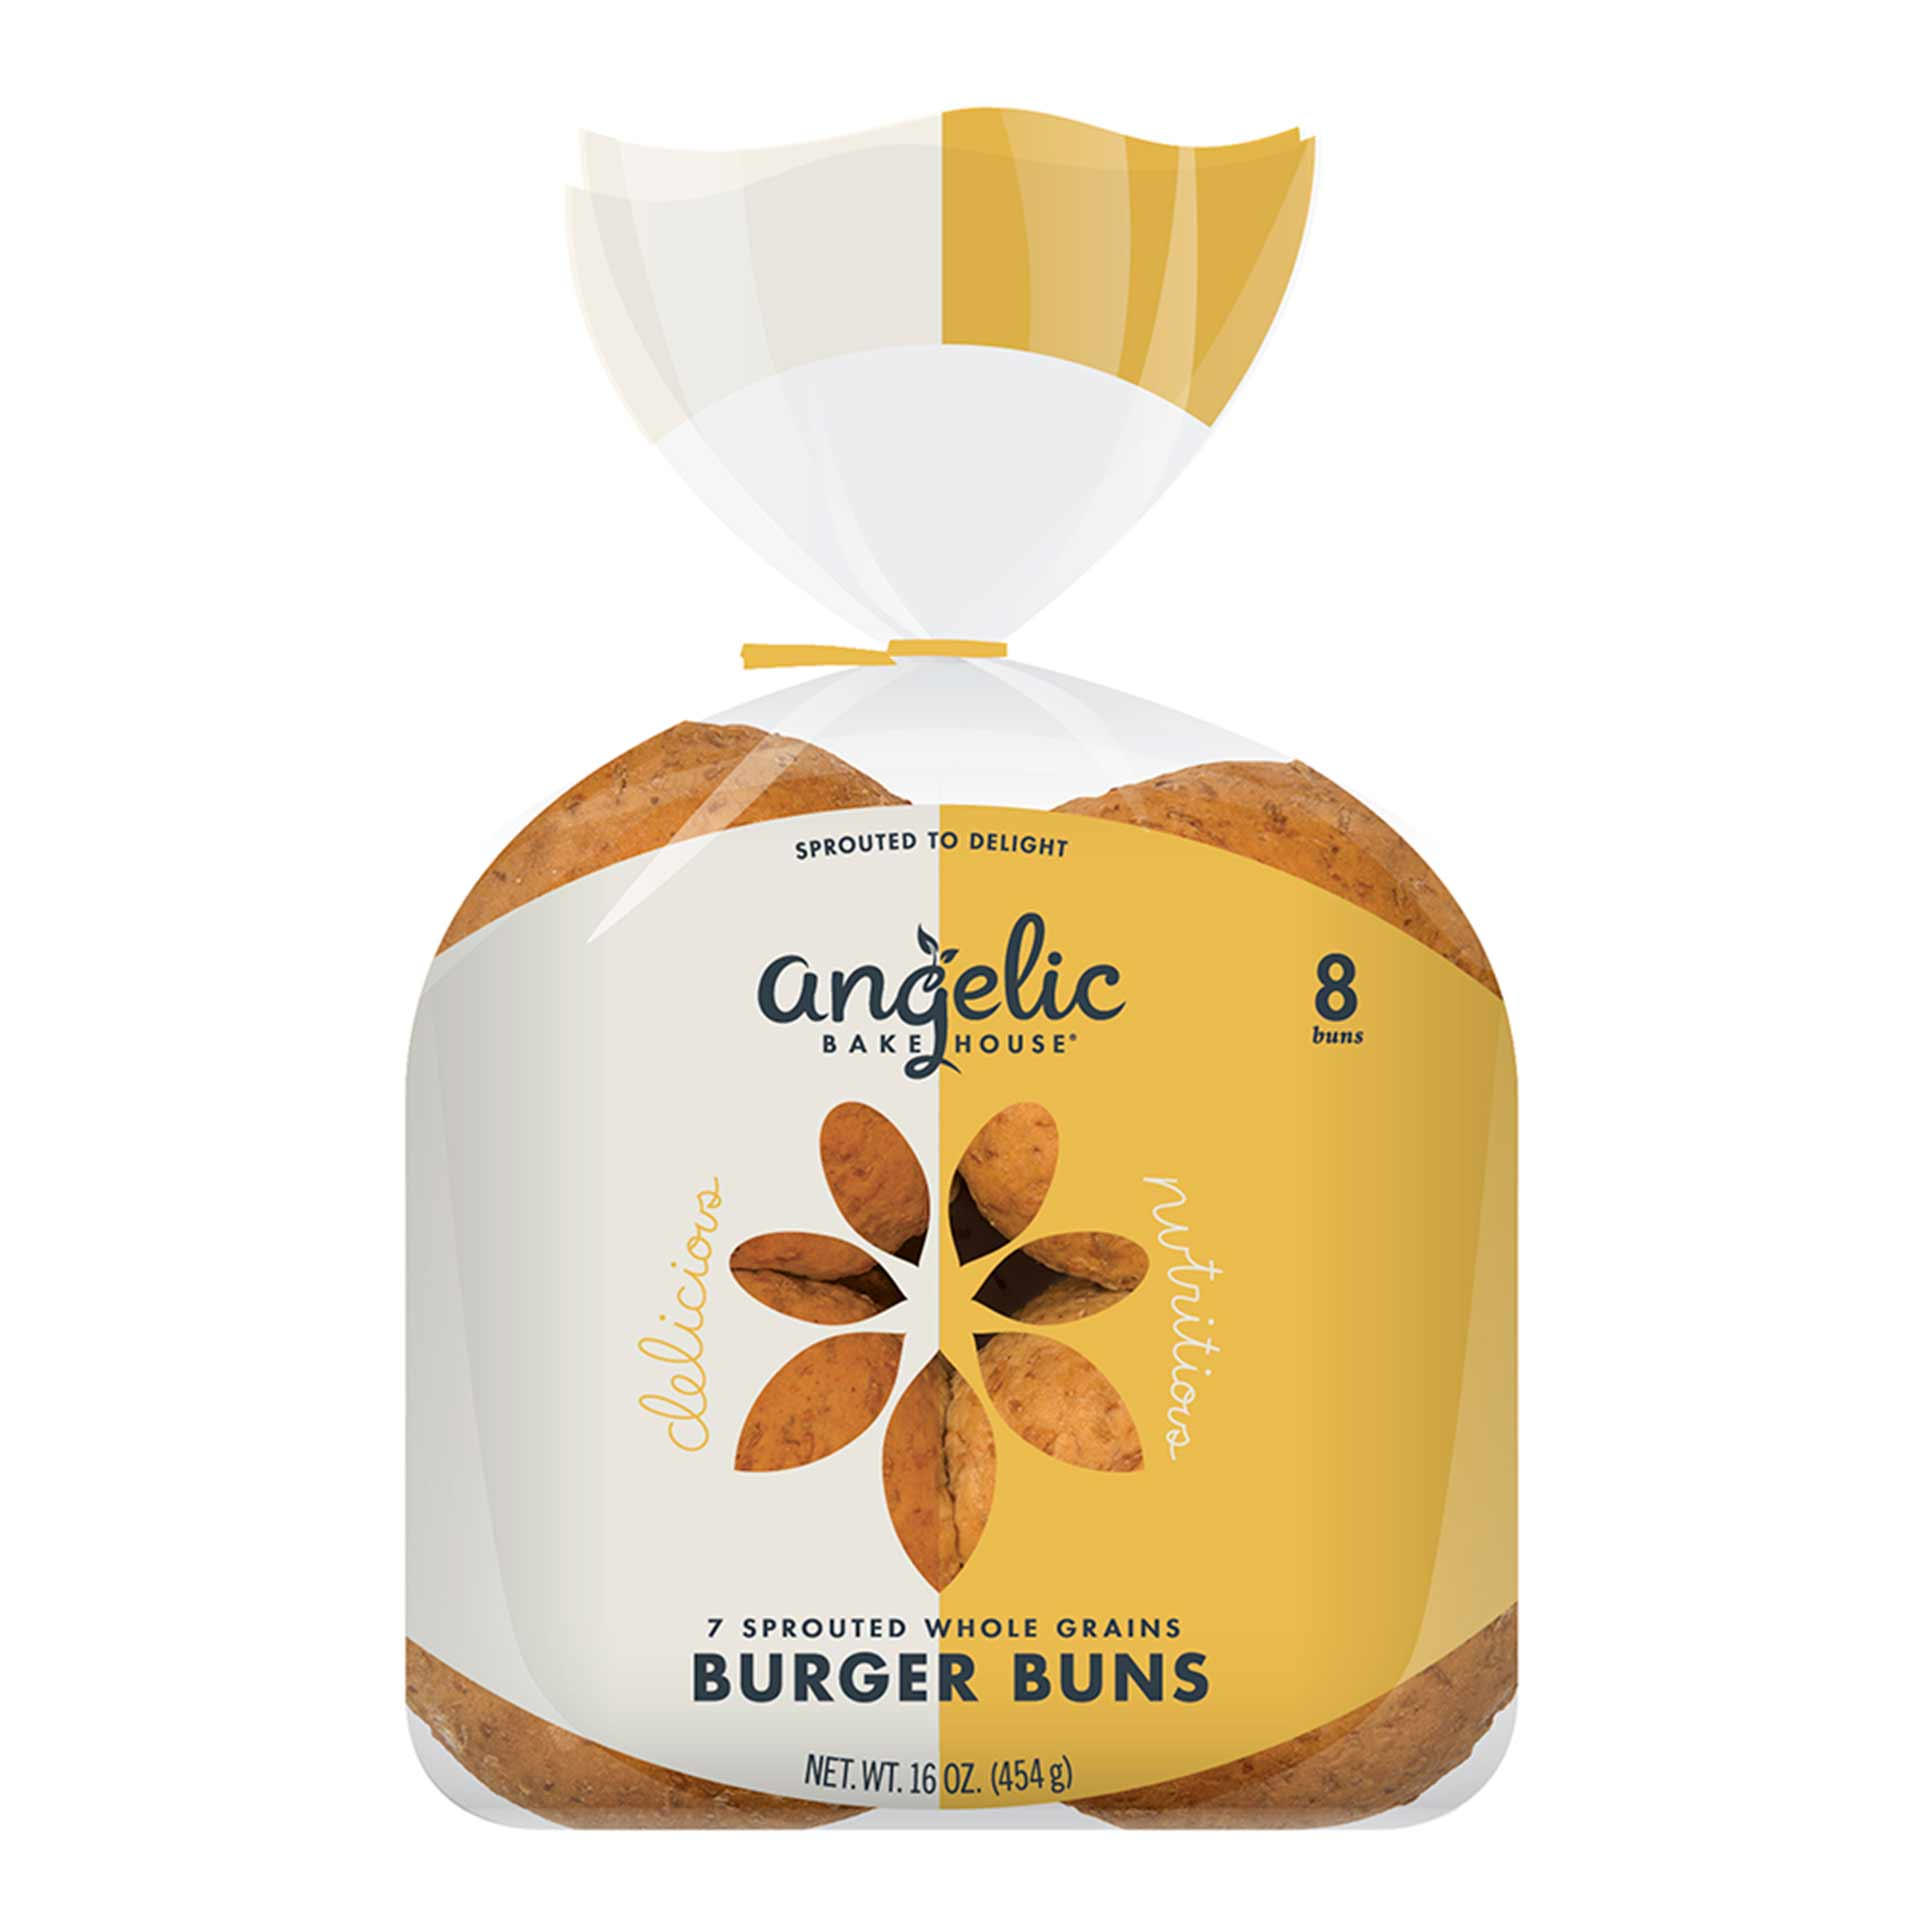 Angelic Hamburger Buns